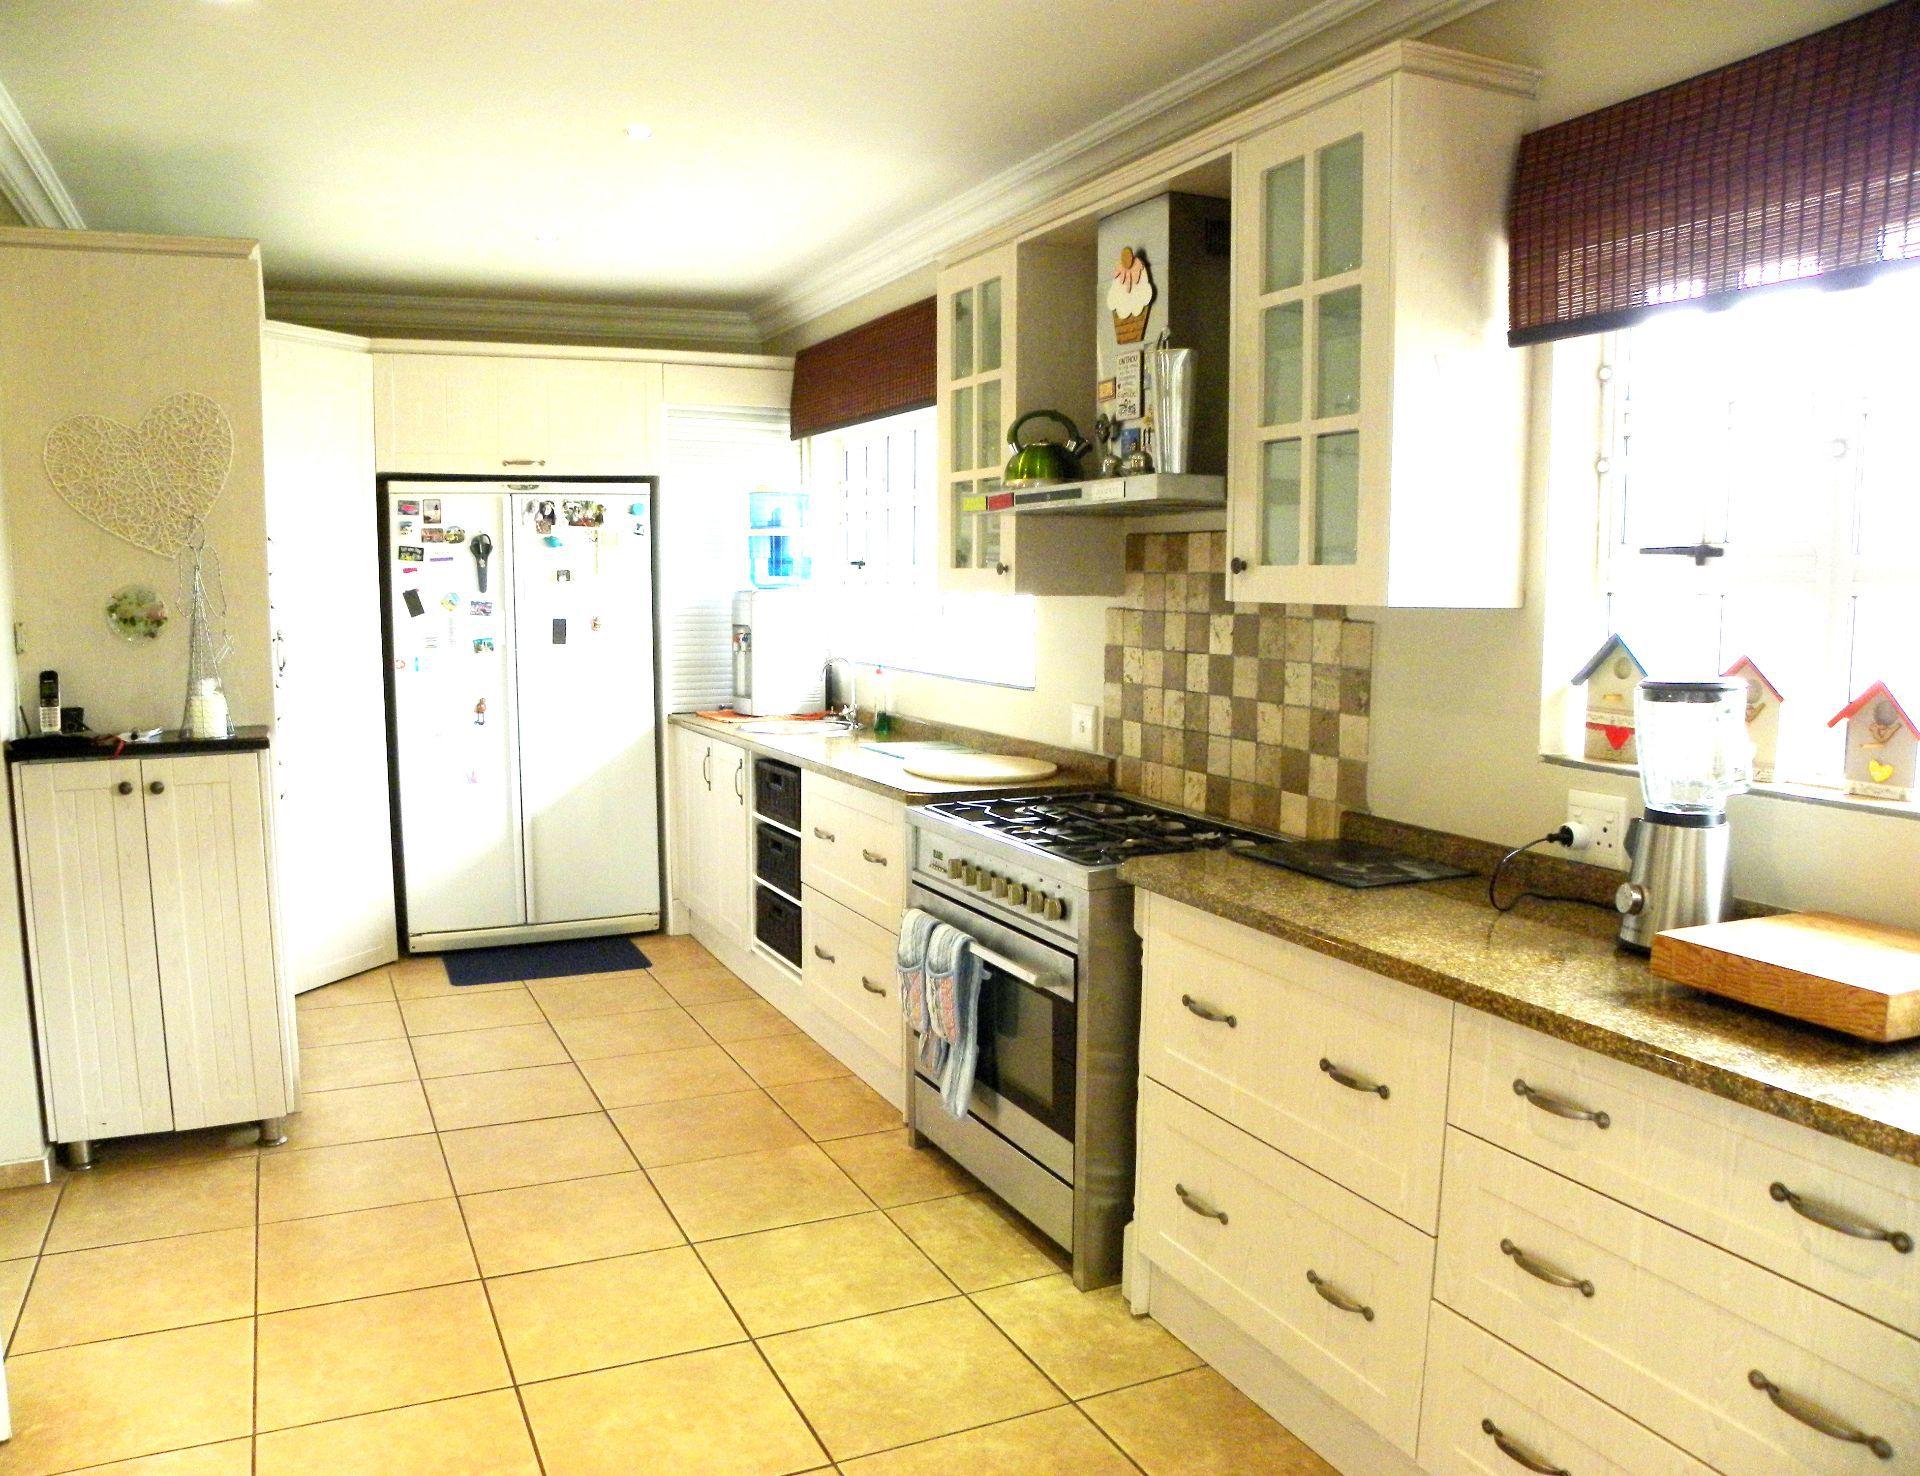 Bonnie Doone property for sale. Ref No: 13553551. Picture no 8